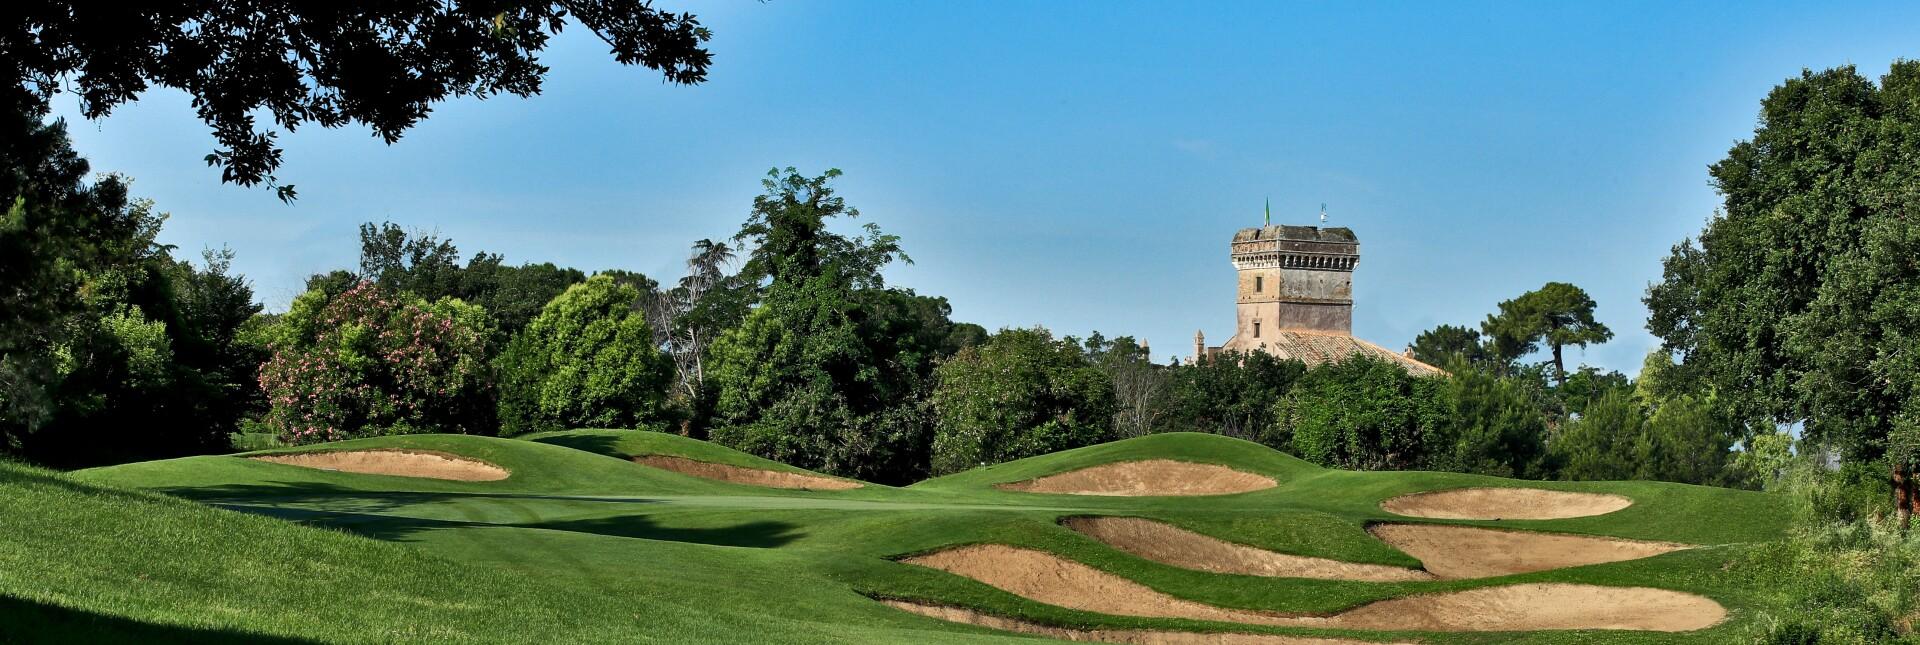 Marco Simone Golf & Country Club_Hole 4.jpg